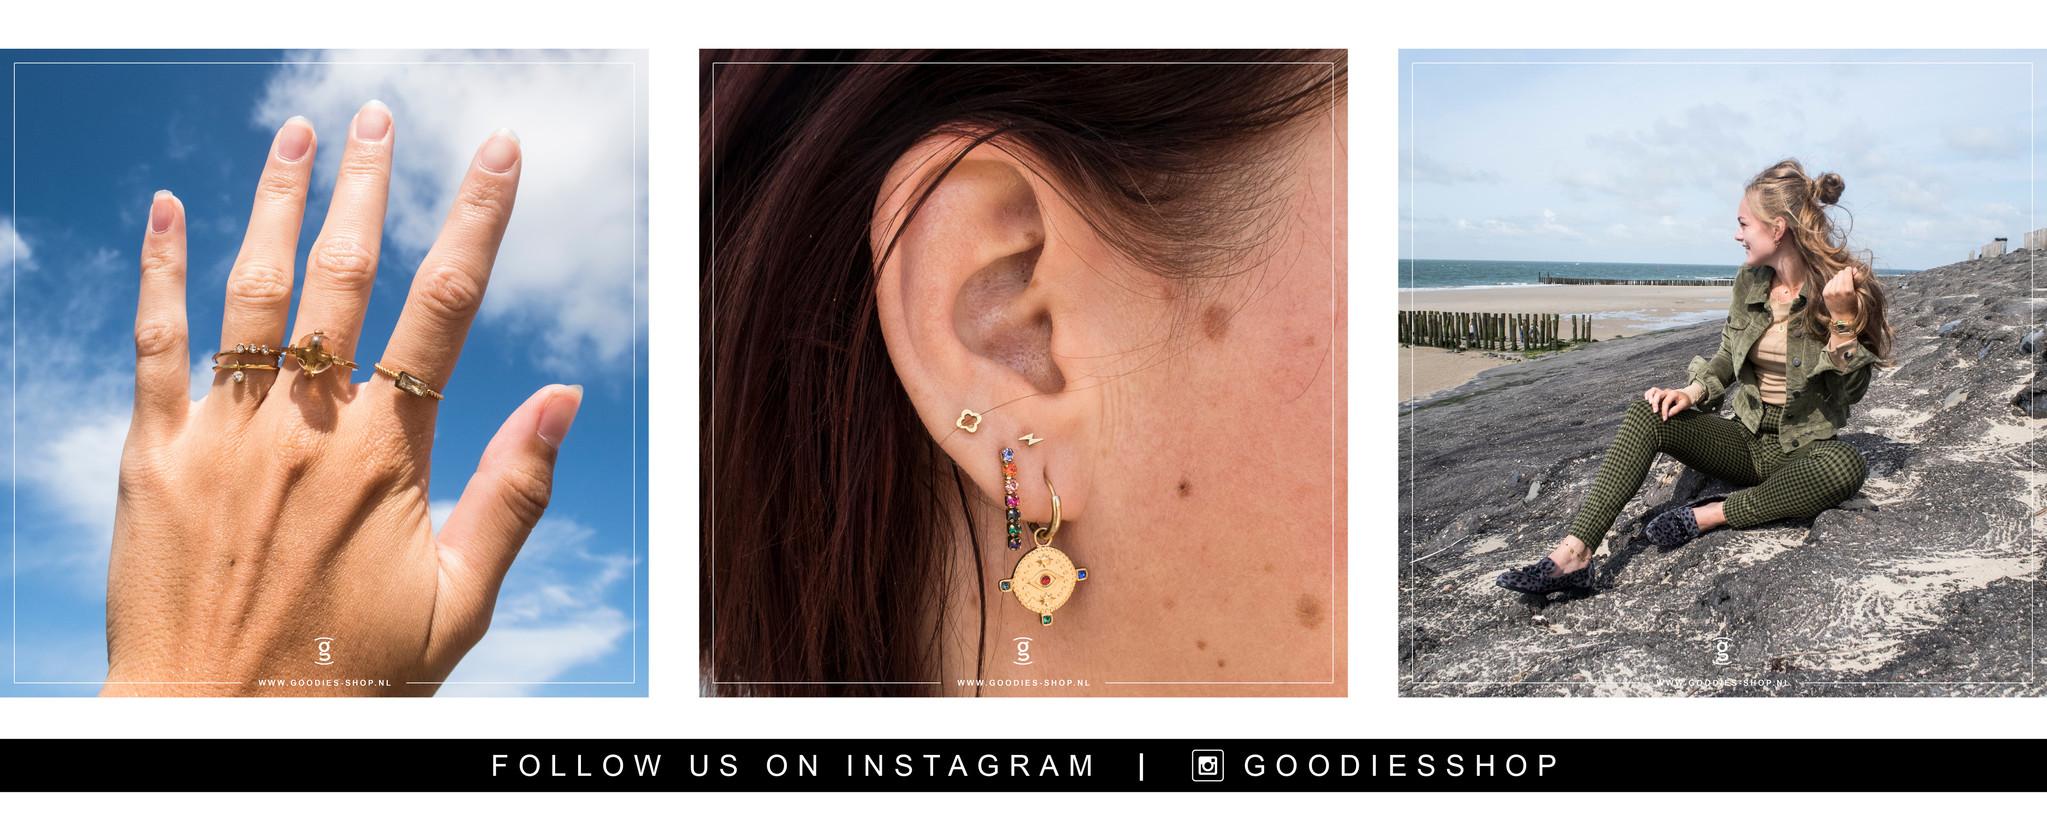 Instagram Goodies